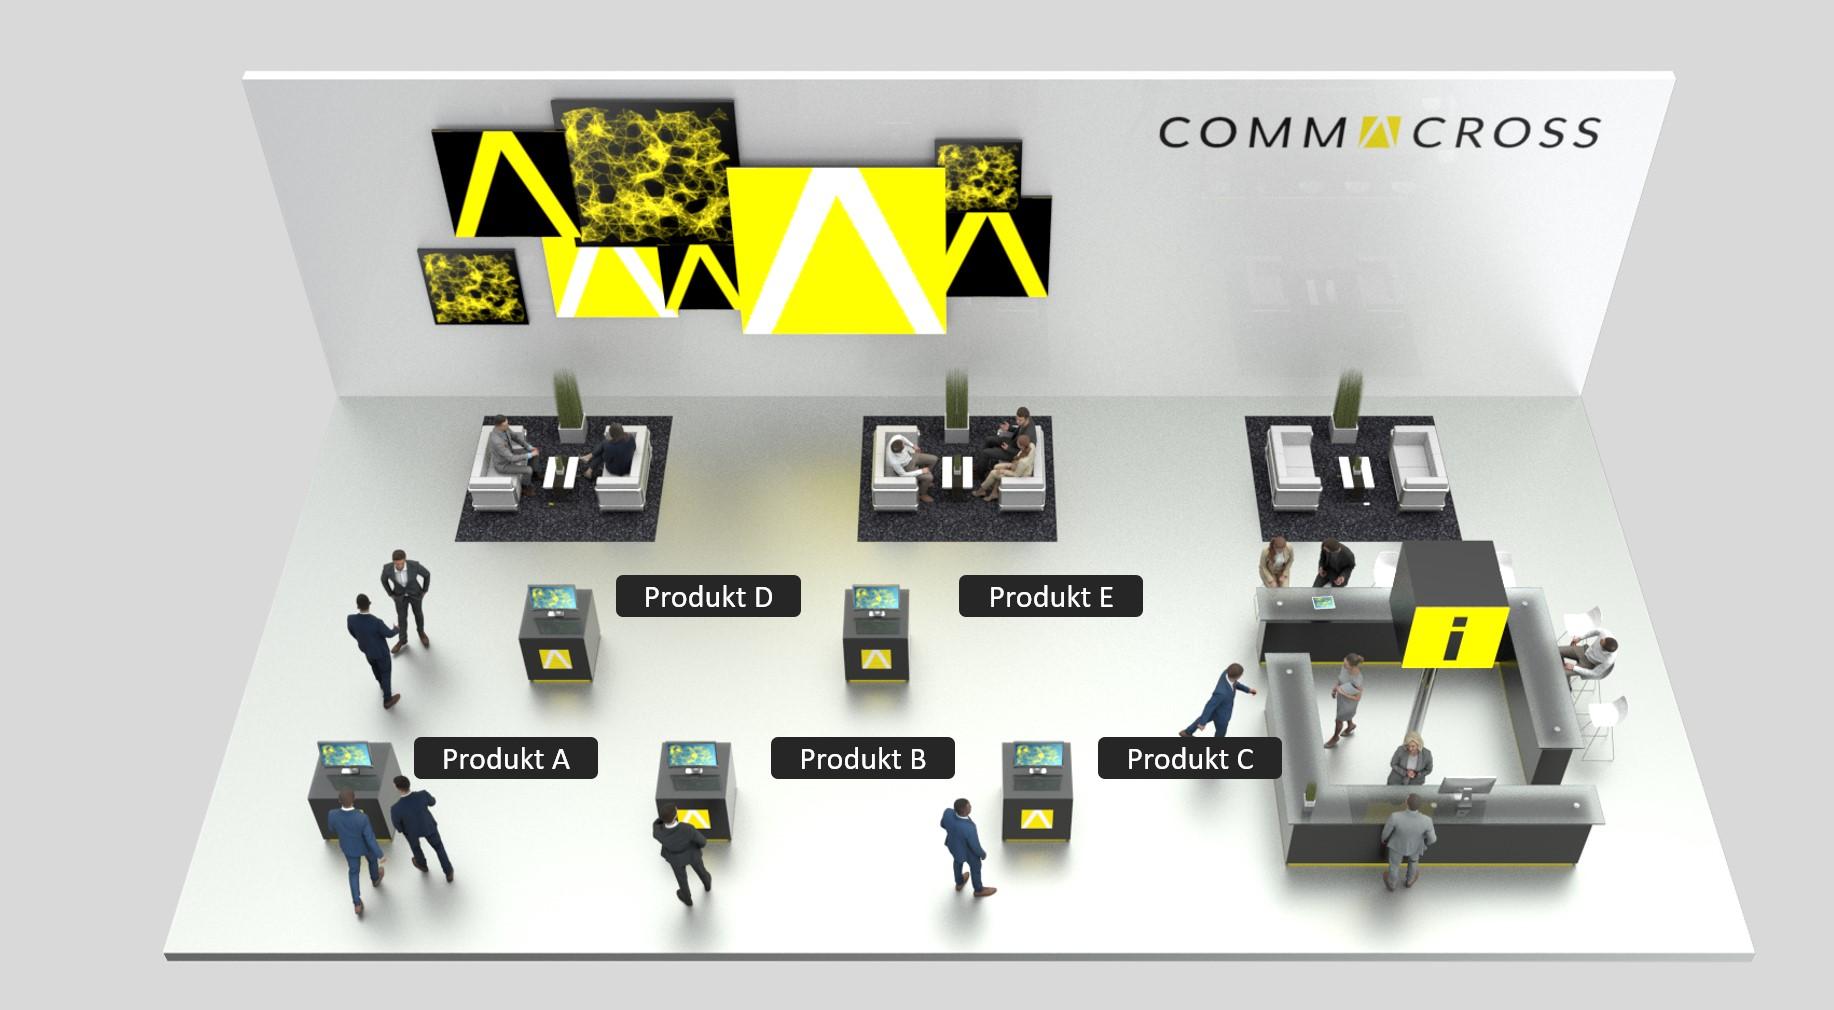 Virtueller Muster-Messestand von commacross mit Touchpoints